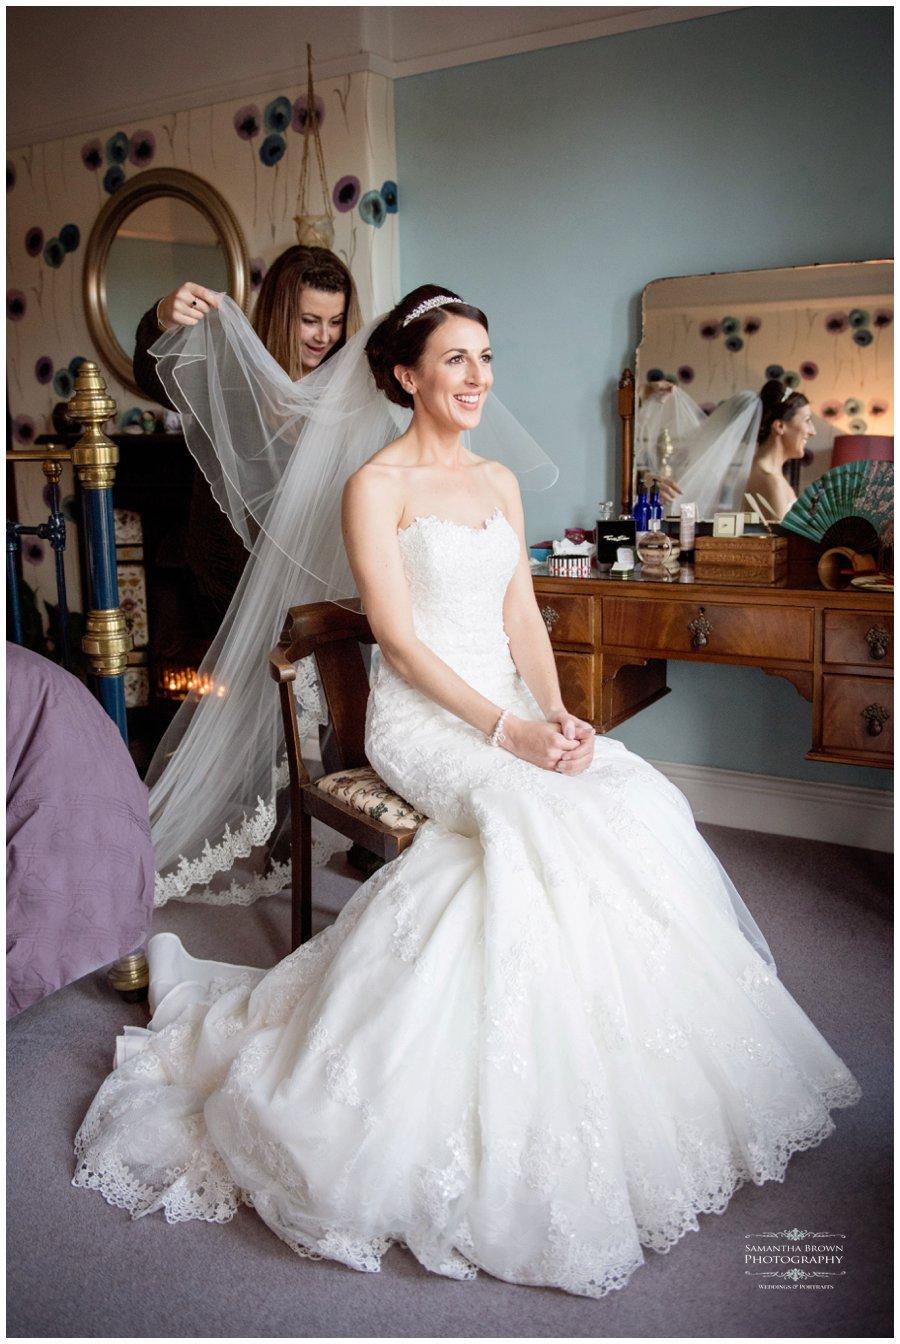 view being put onto bride